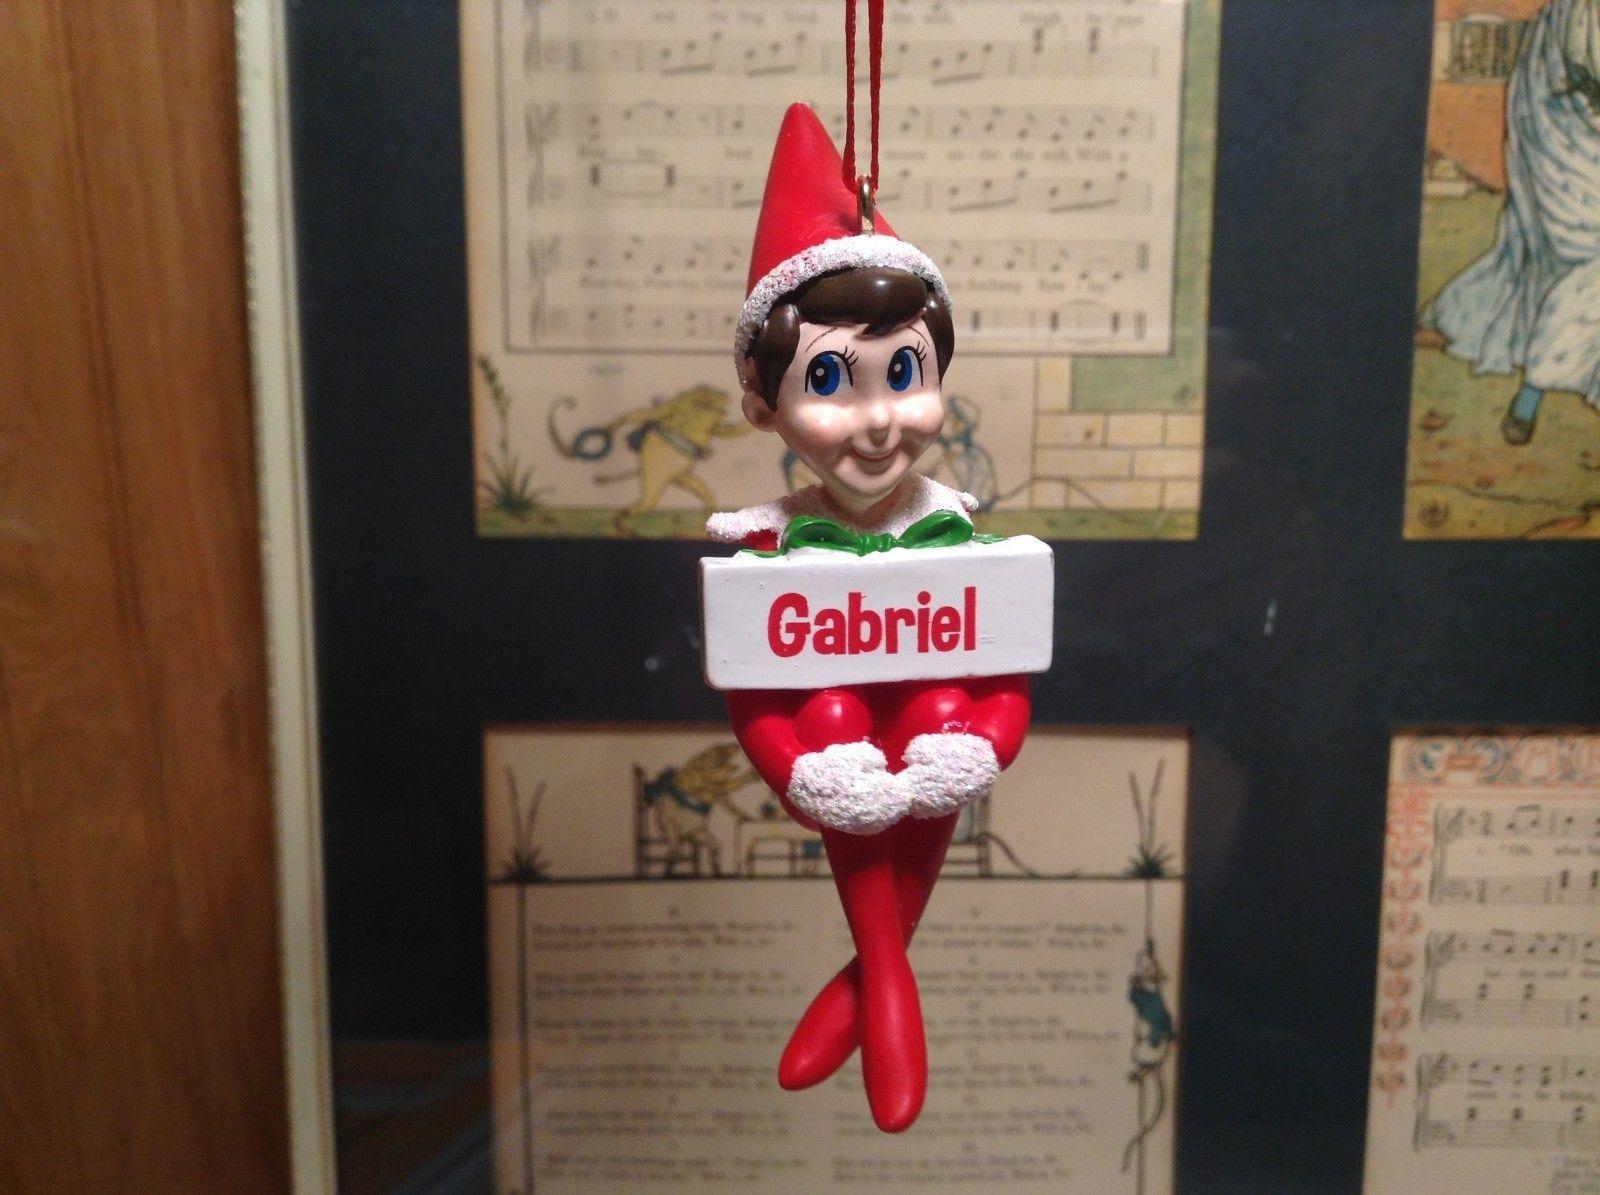 Dept 56 - Elf on the Shelf - Gabriel  banner Christmas Ornament